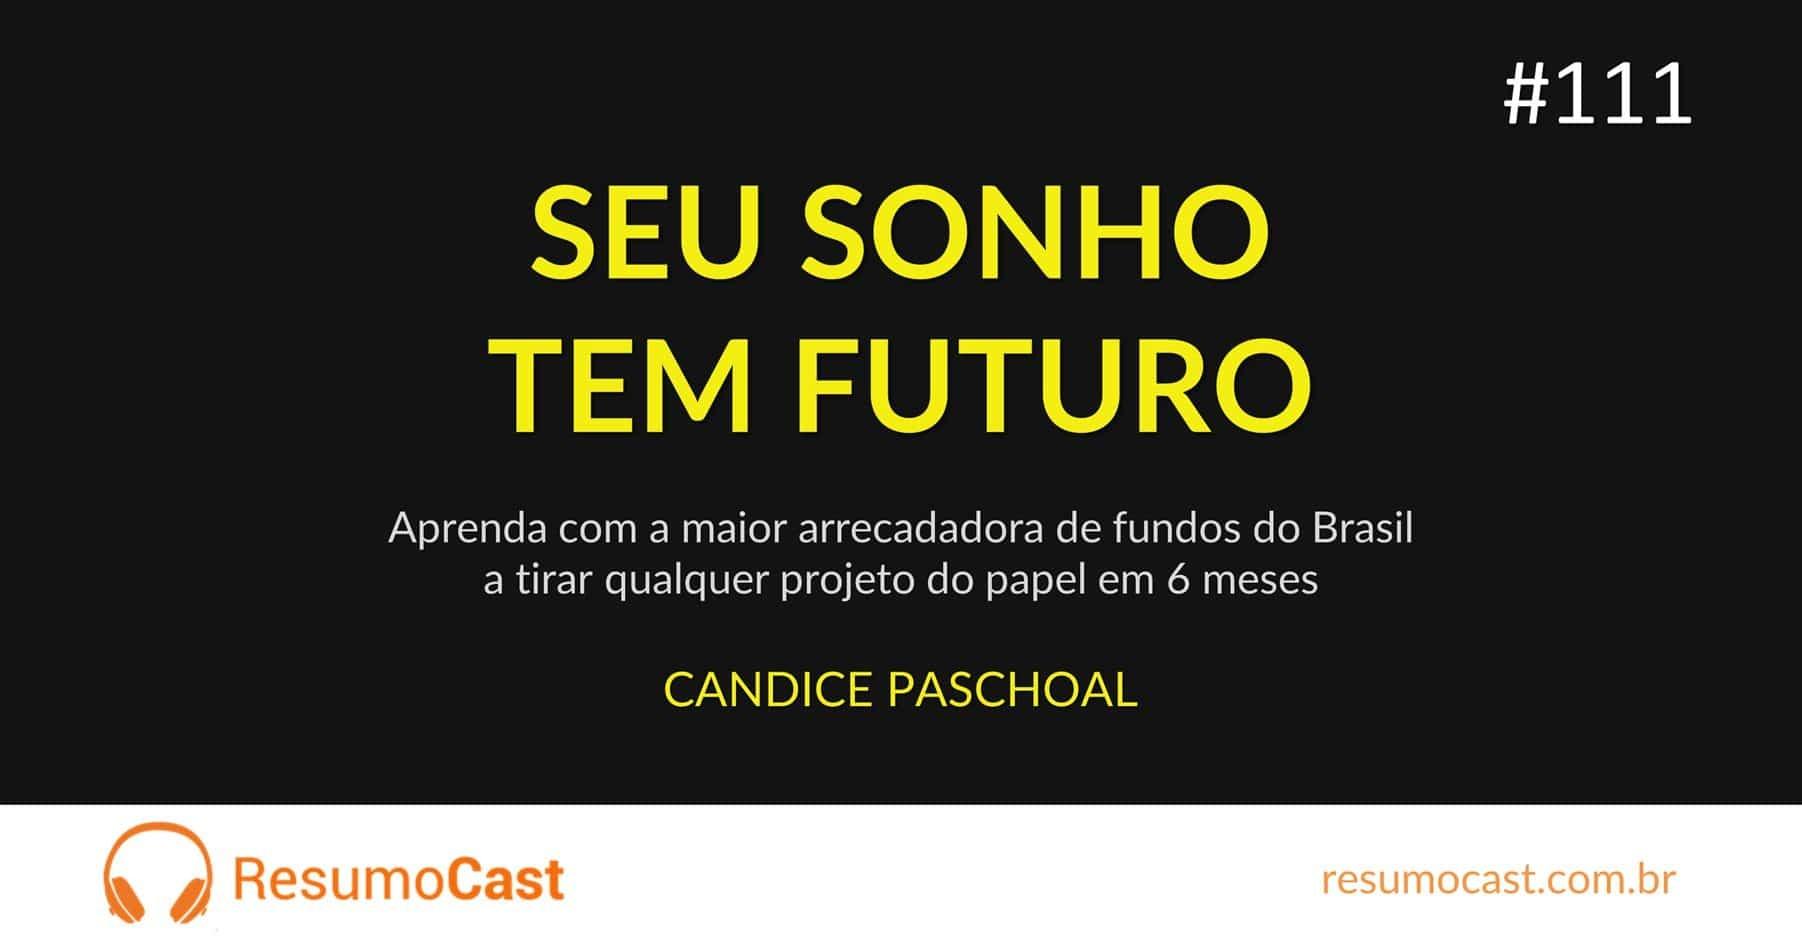 Seu Sonho tem Futuro – Candice Pascoal | T1#111